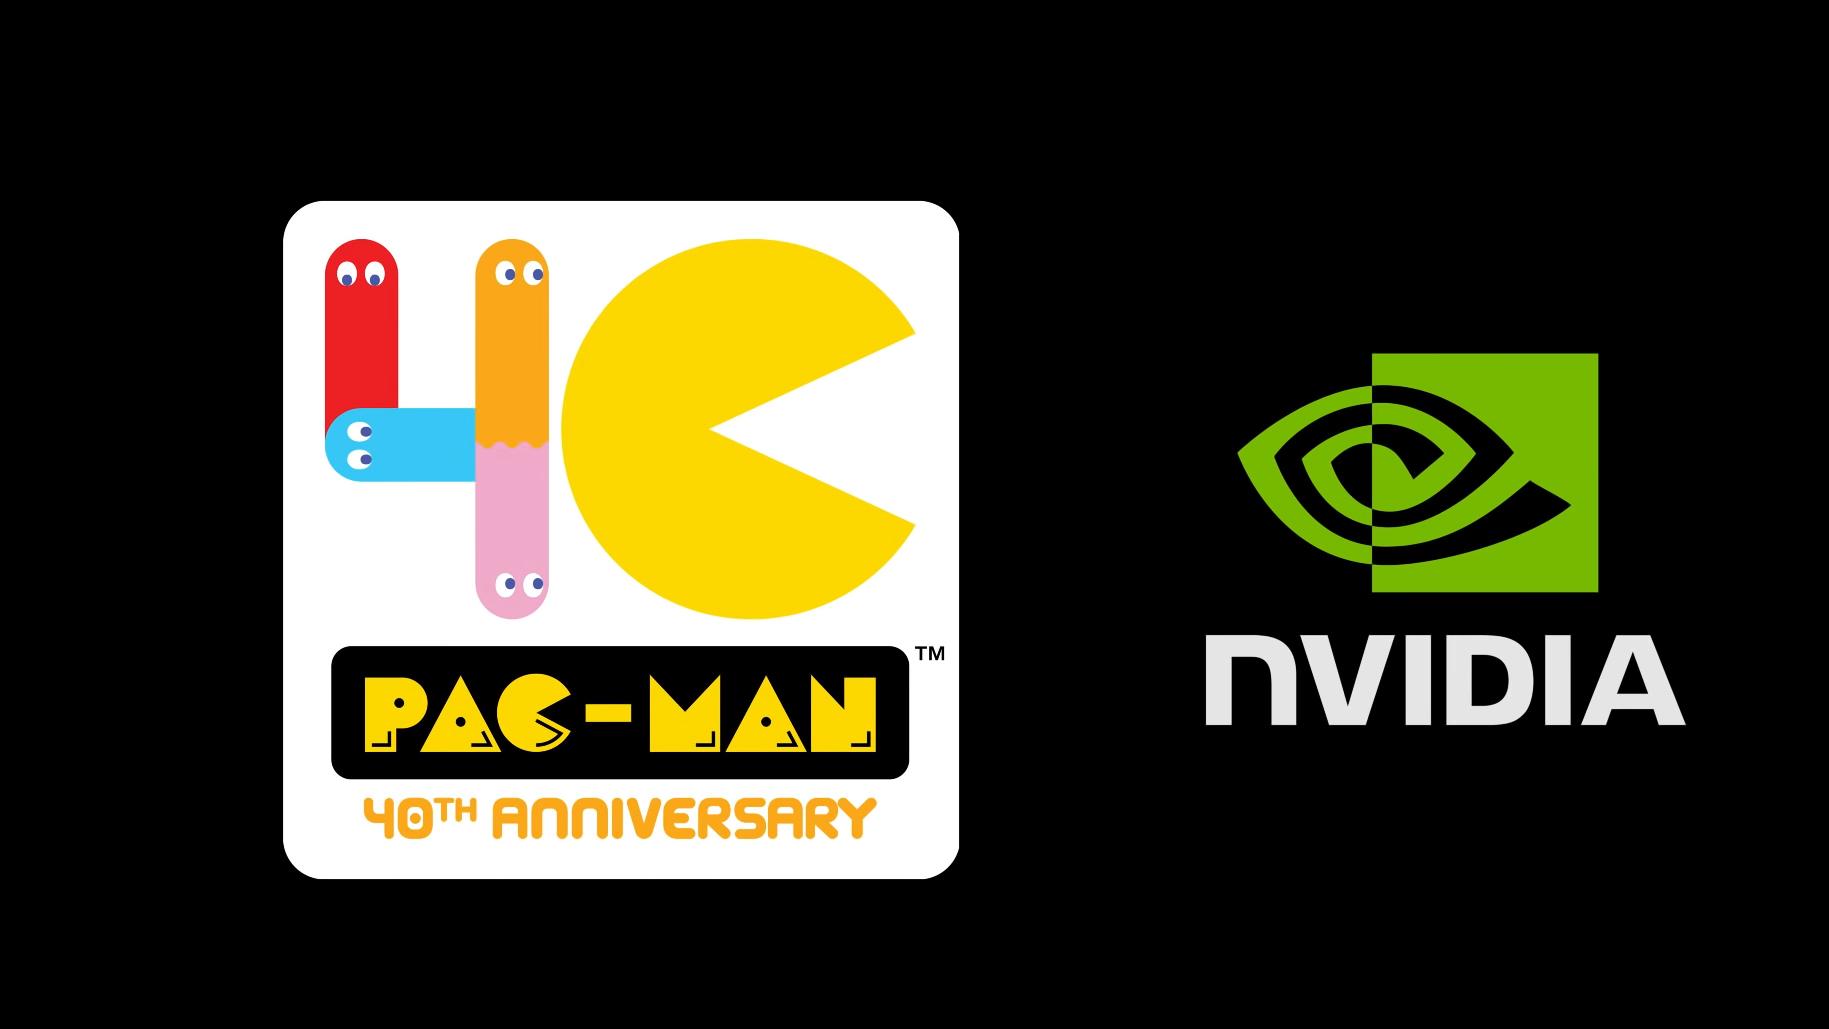 NVIDIA PAC-MAN